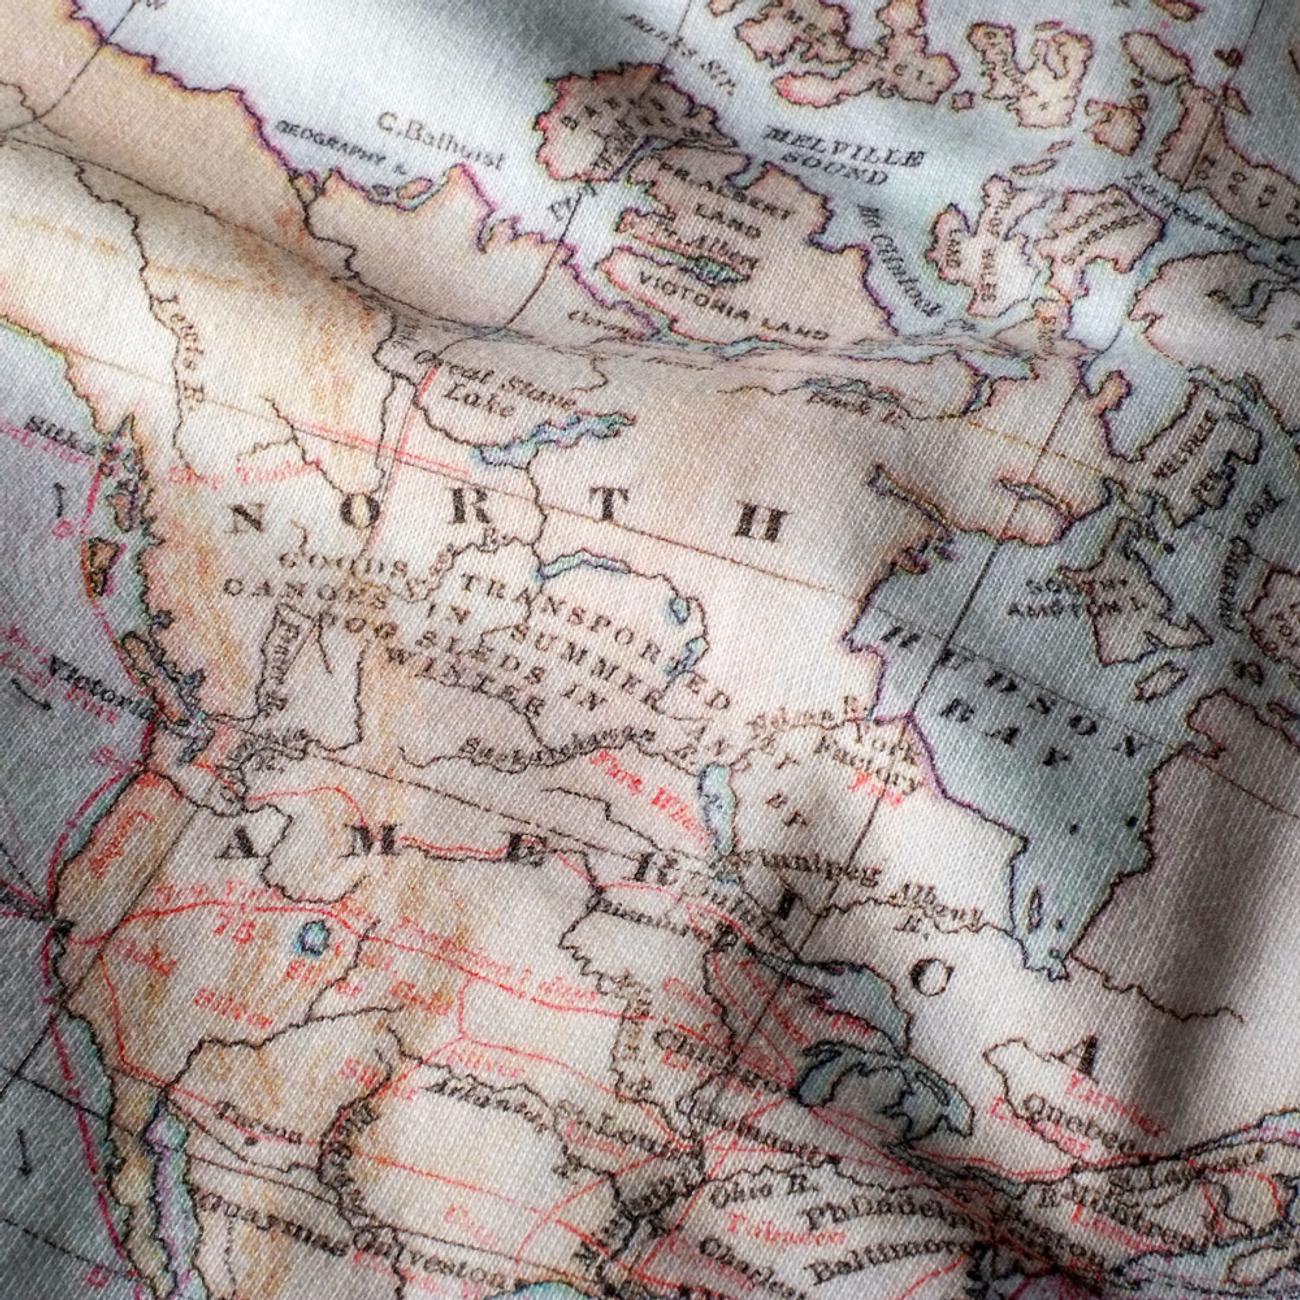 Joggers Tomelilla Map